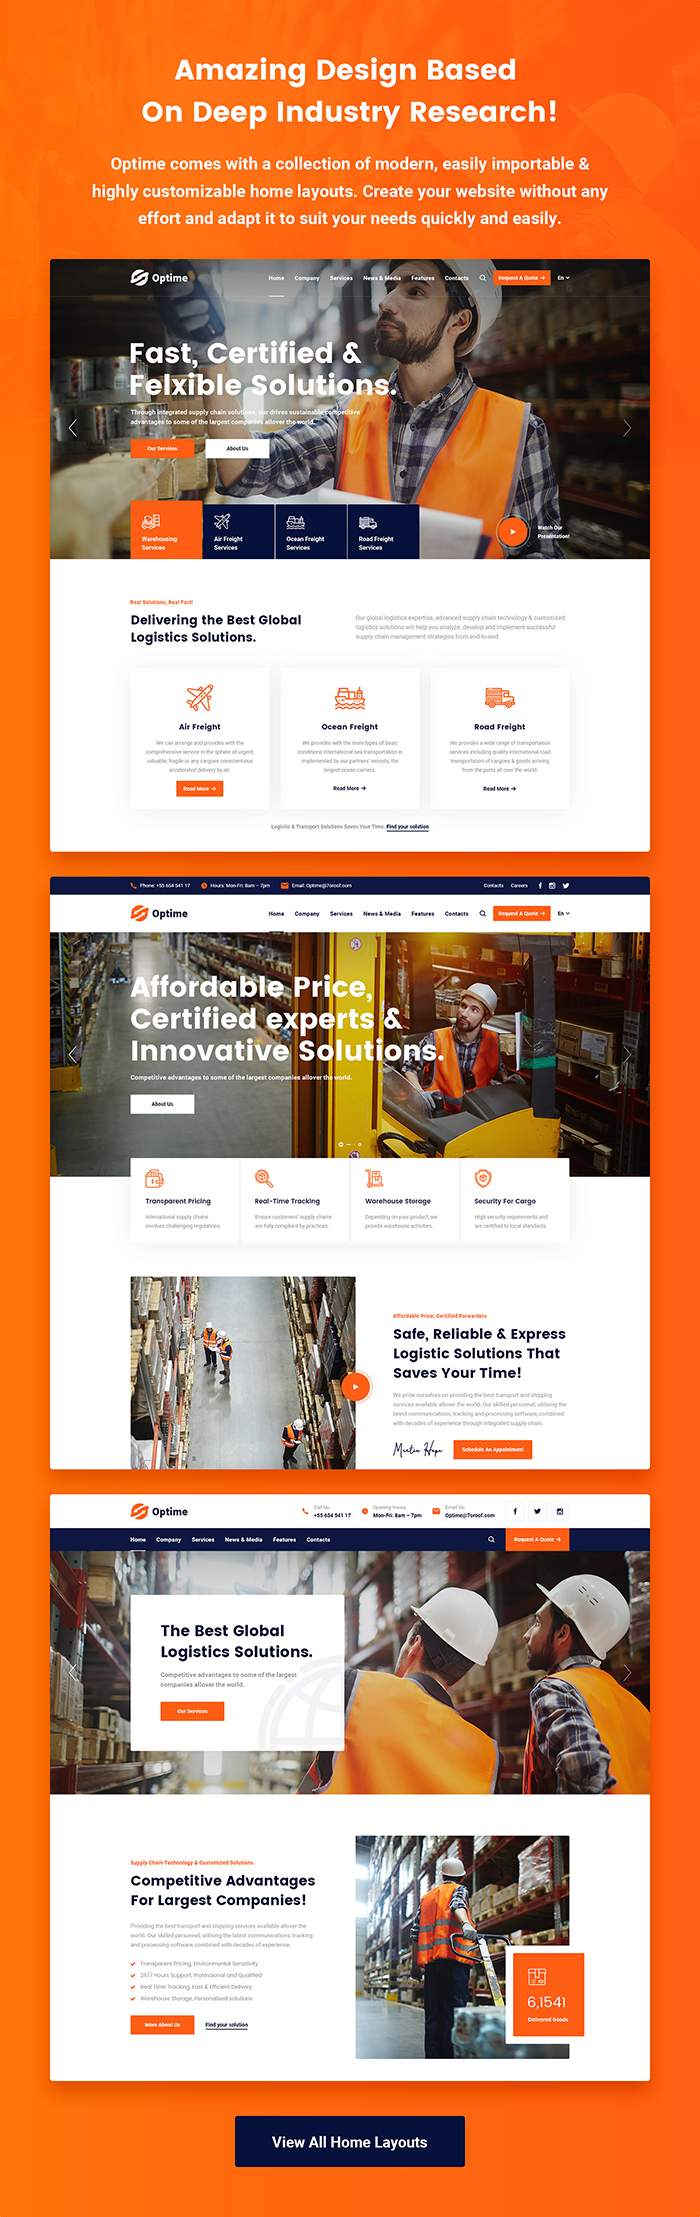 Optime - Logistics & Transportation WordPress Theme by